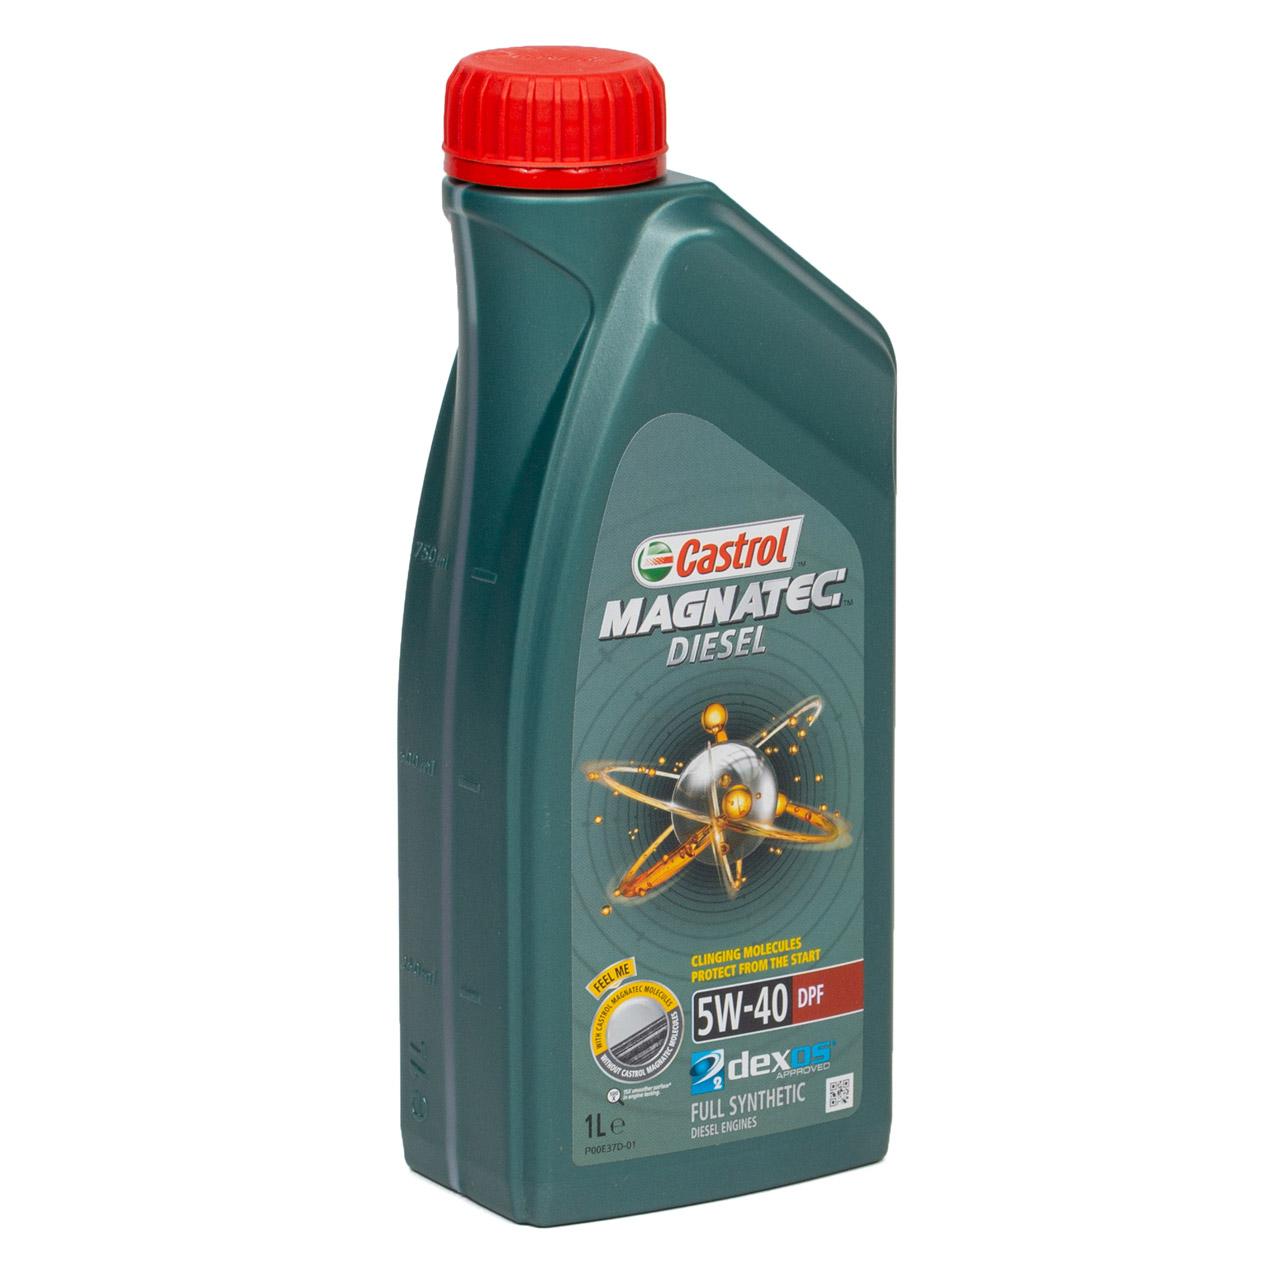 CASTROL Magnatec DIESEL DPF Motoröl Öl 5W40 dexos2 Ford WSS-M2C917-A - 7 Liter